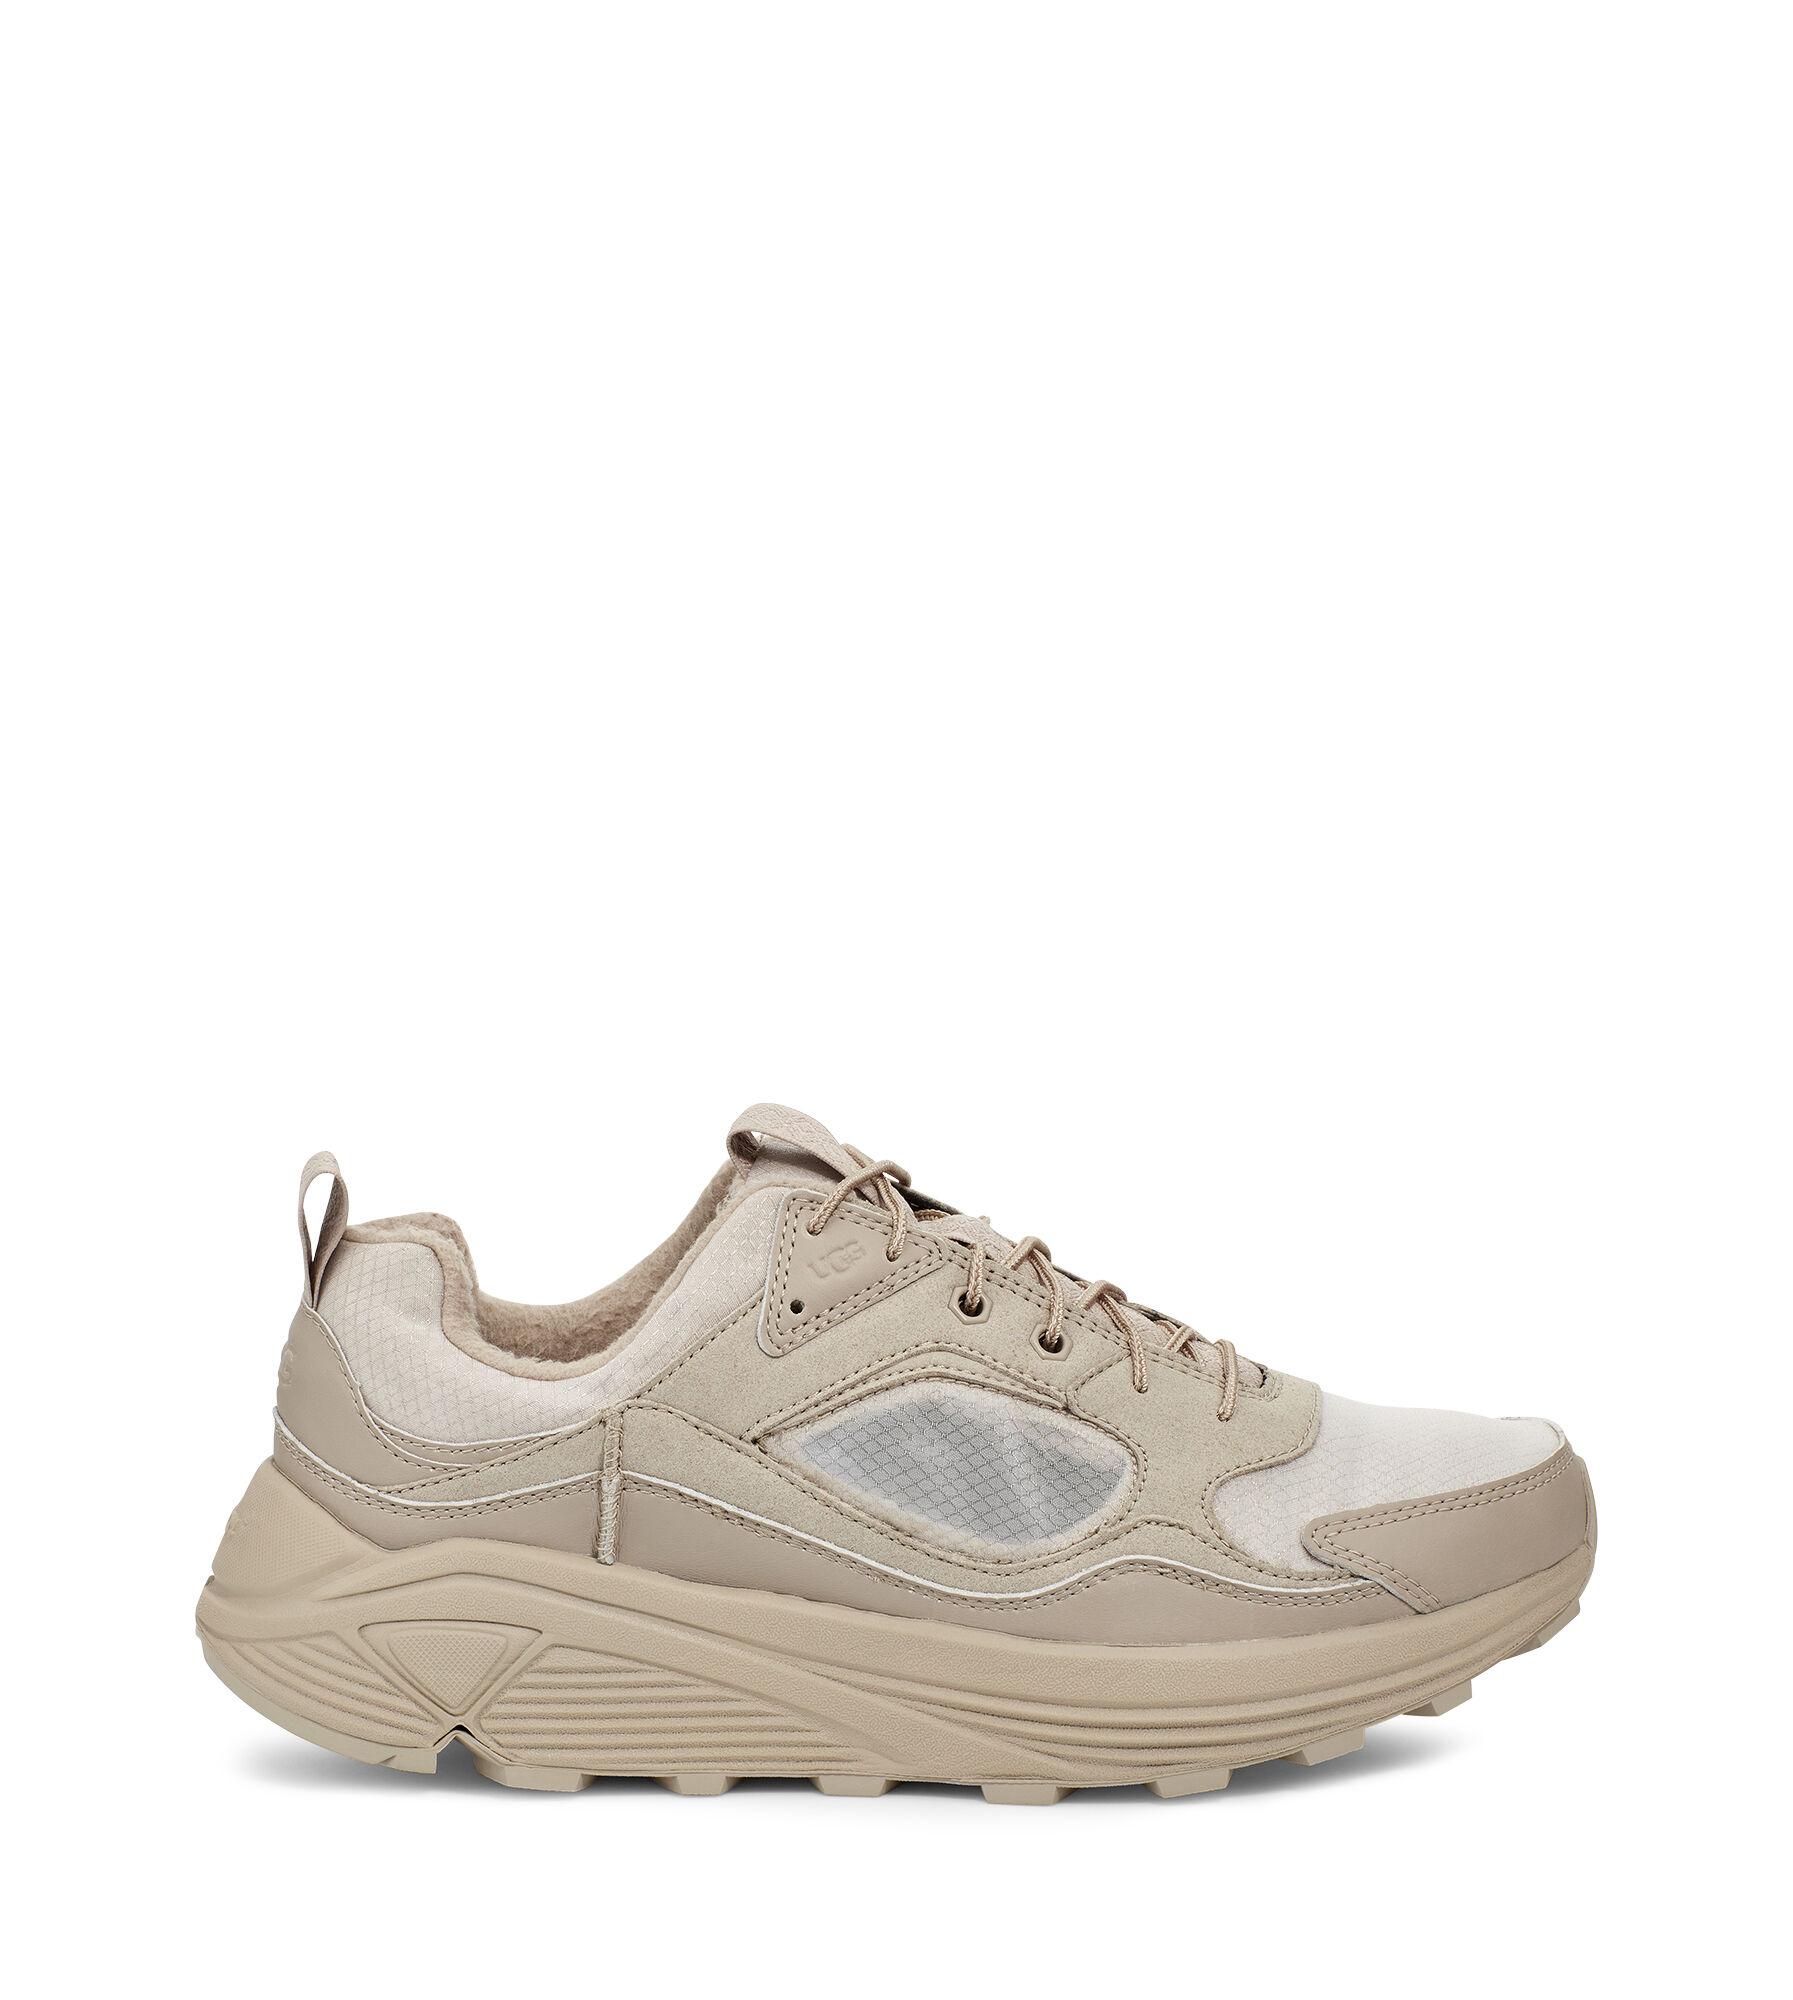 sneakers ugg 38